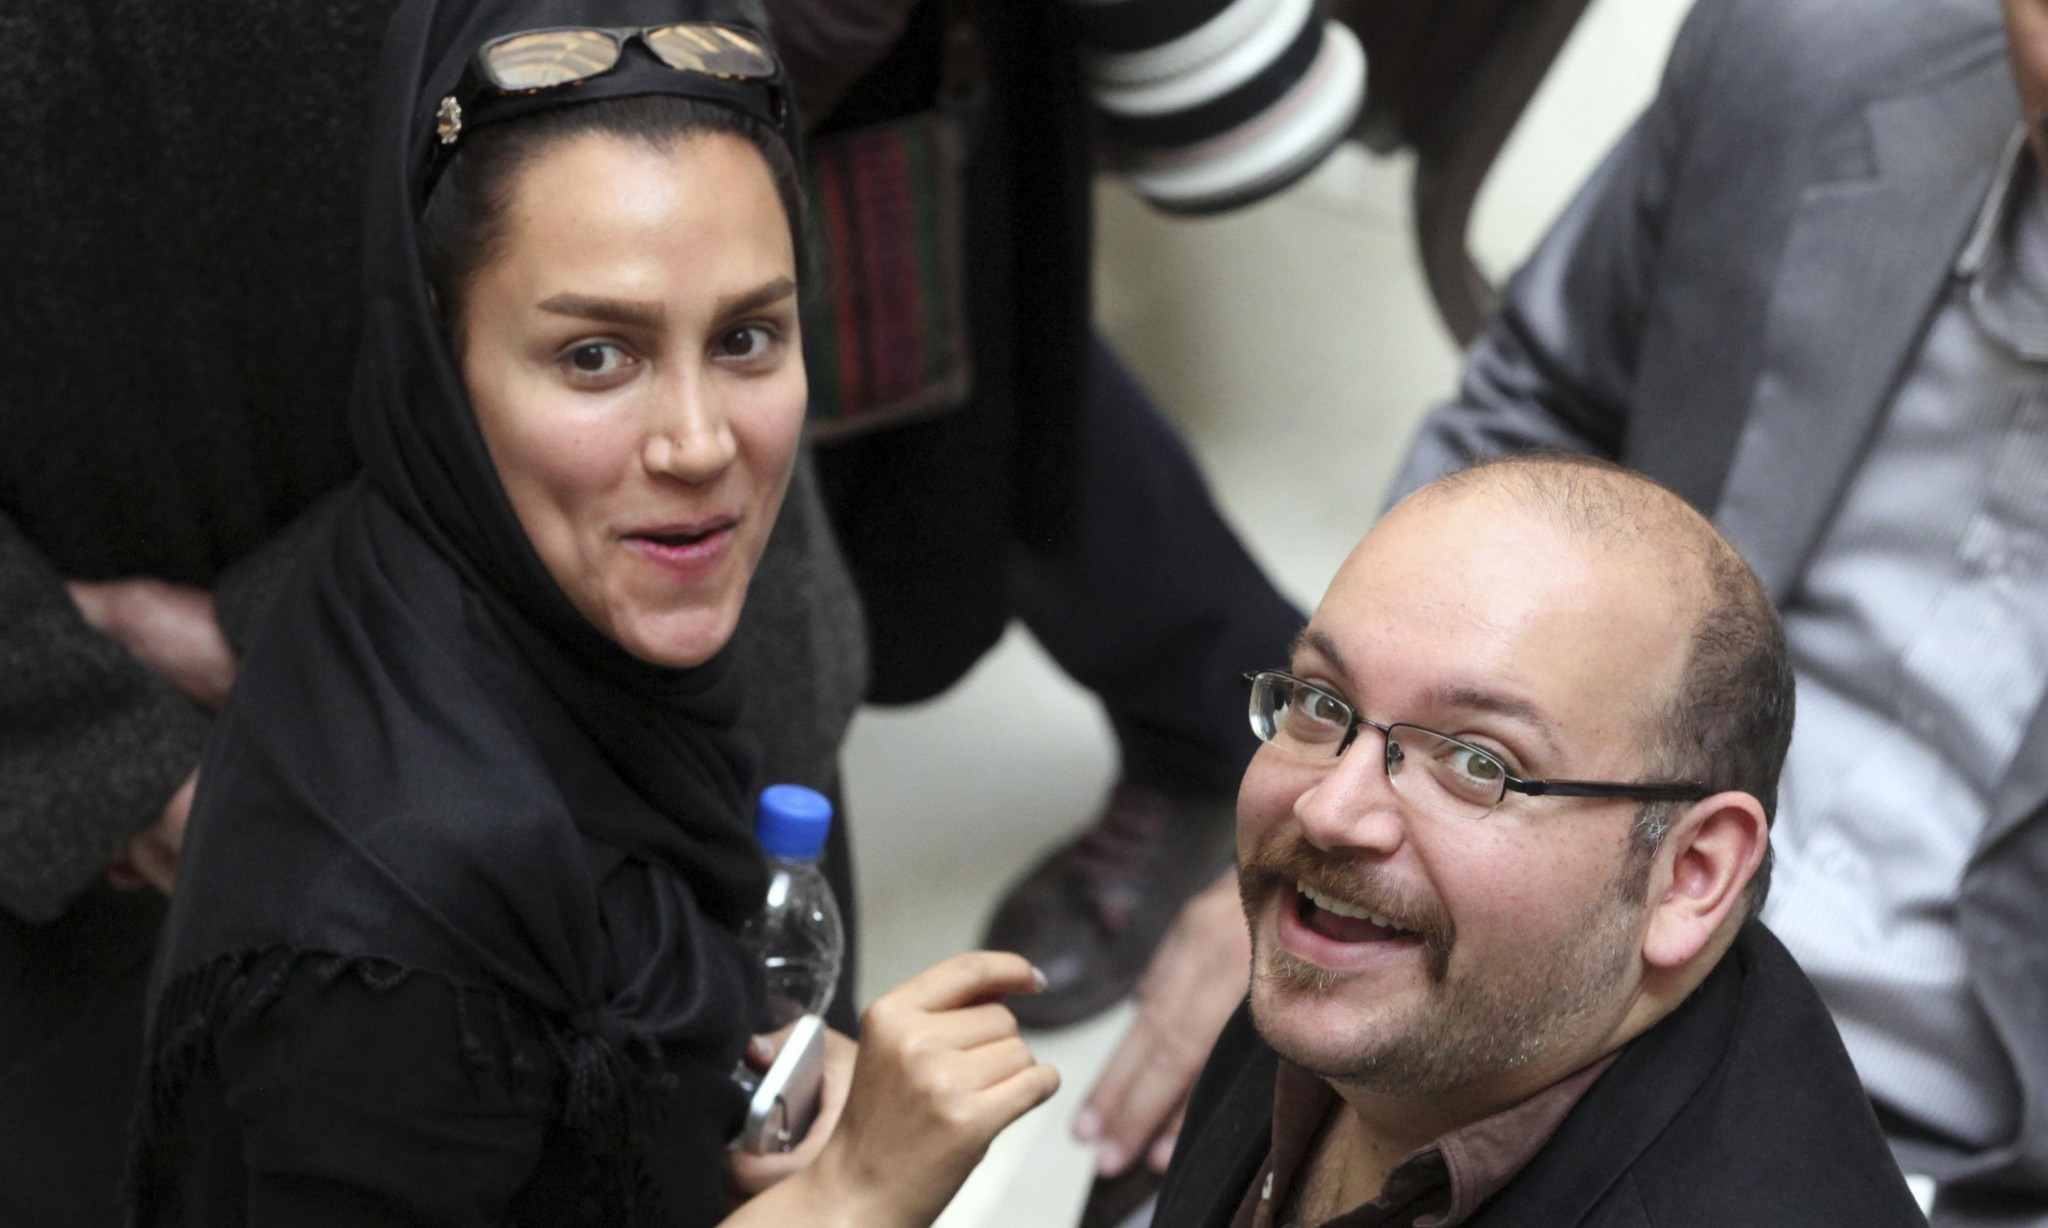 Iran releases Washington Post journalist Jason Rezaian in prisoner swap with US